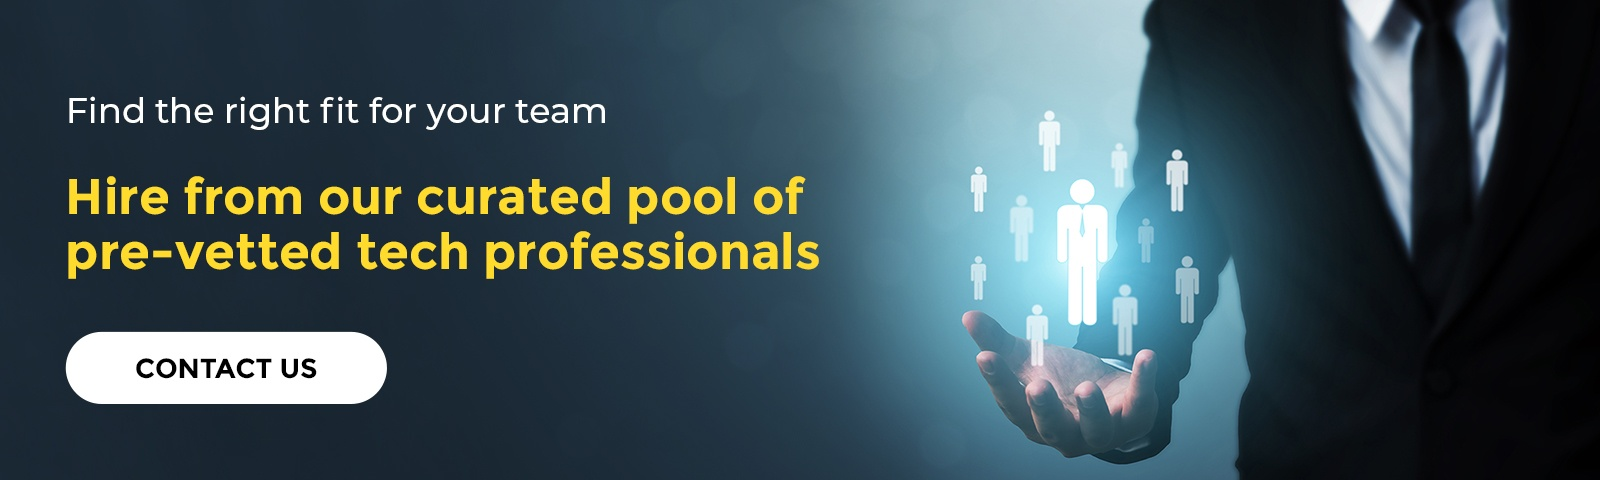 Tech Professionals